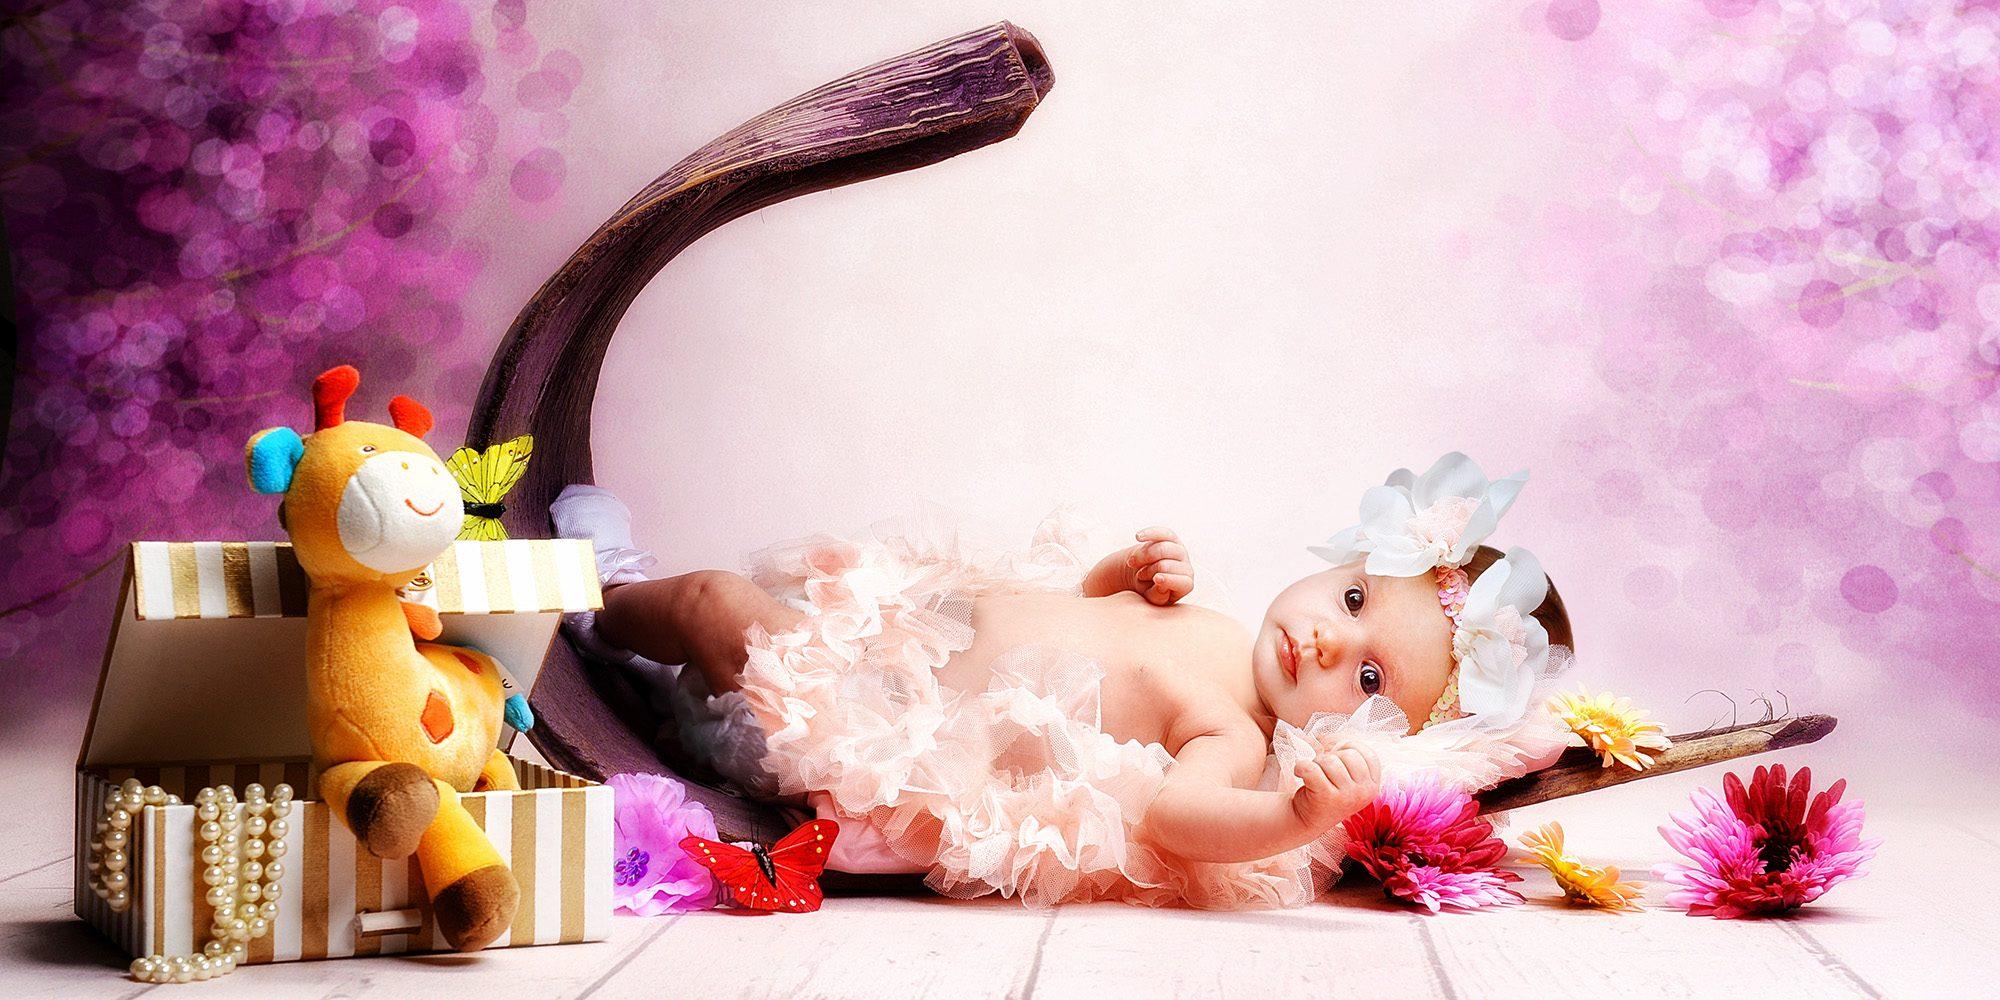 Baby Fotoshooting-Newborn-Baby-fotografie